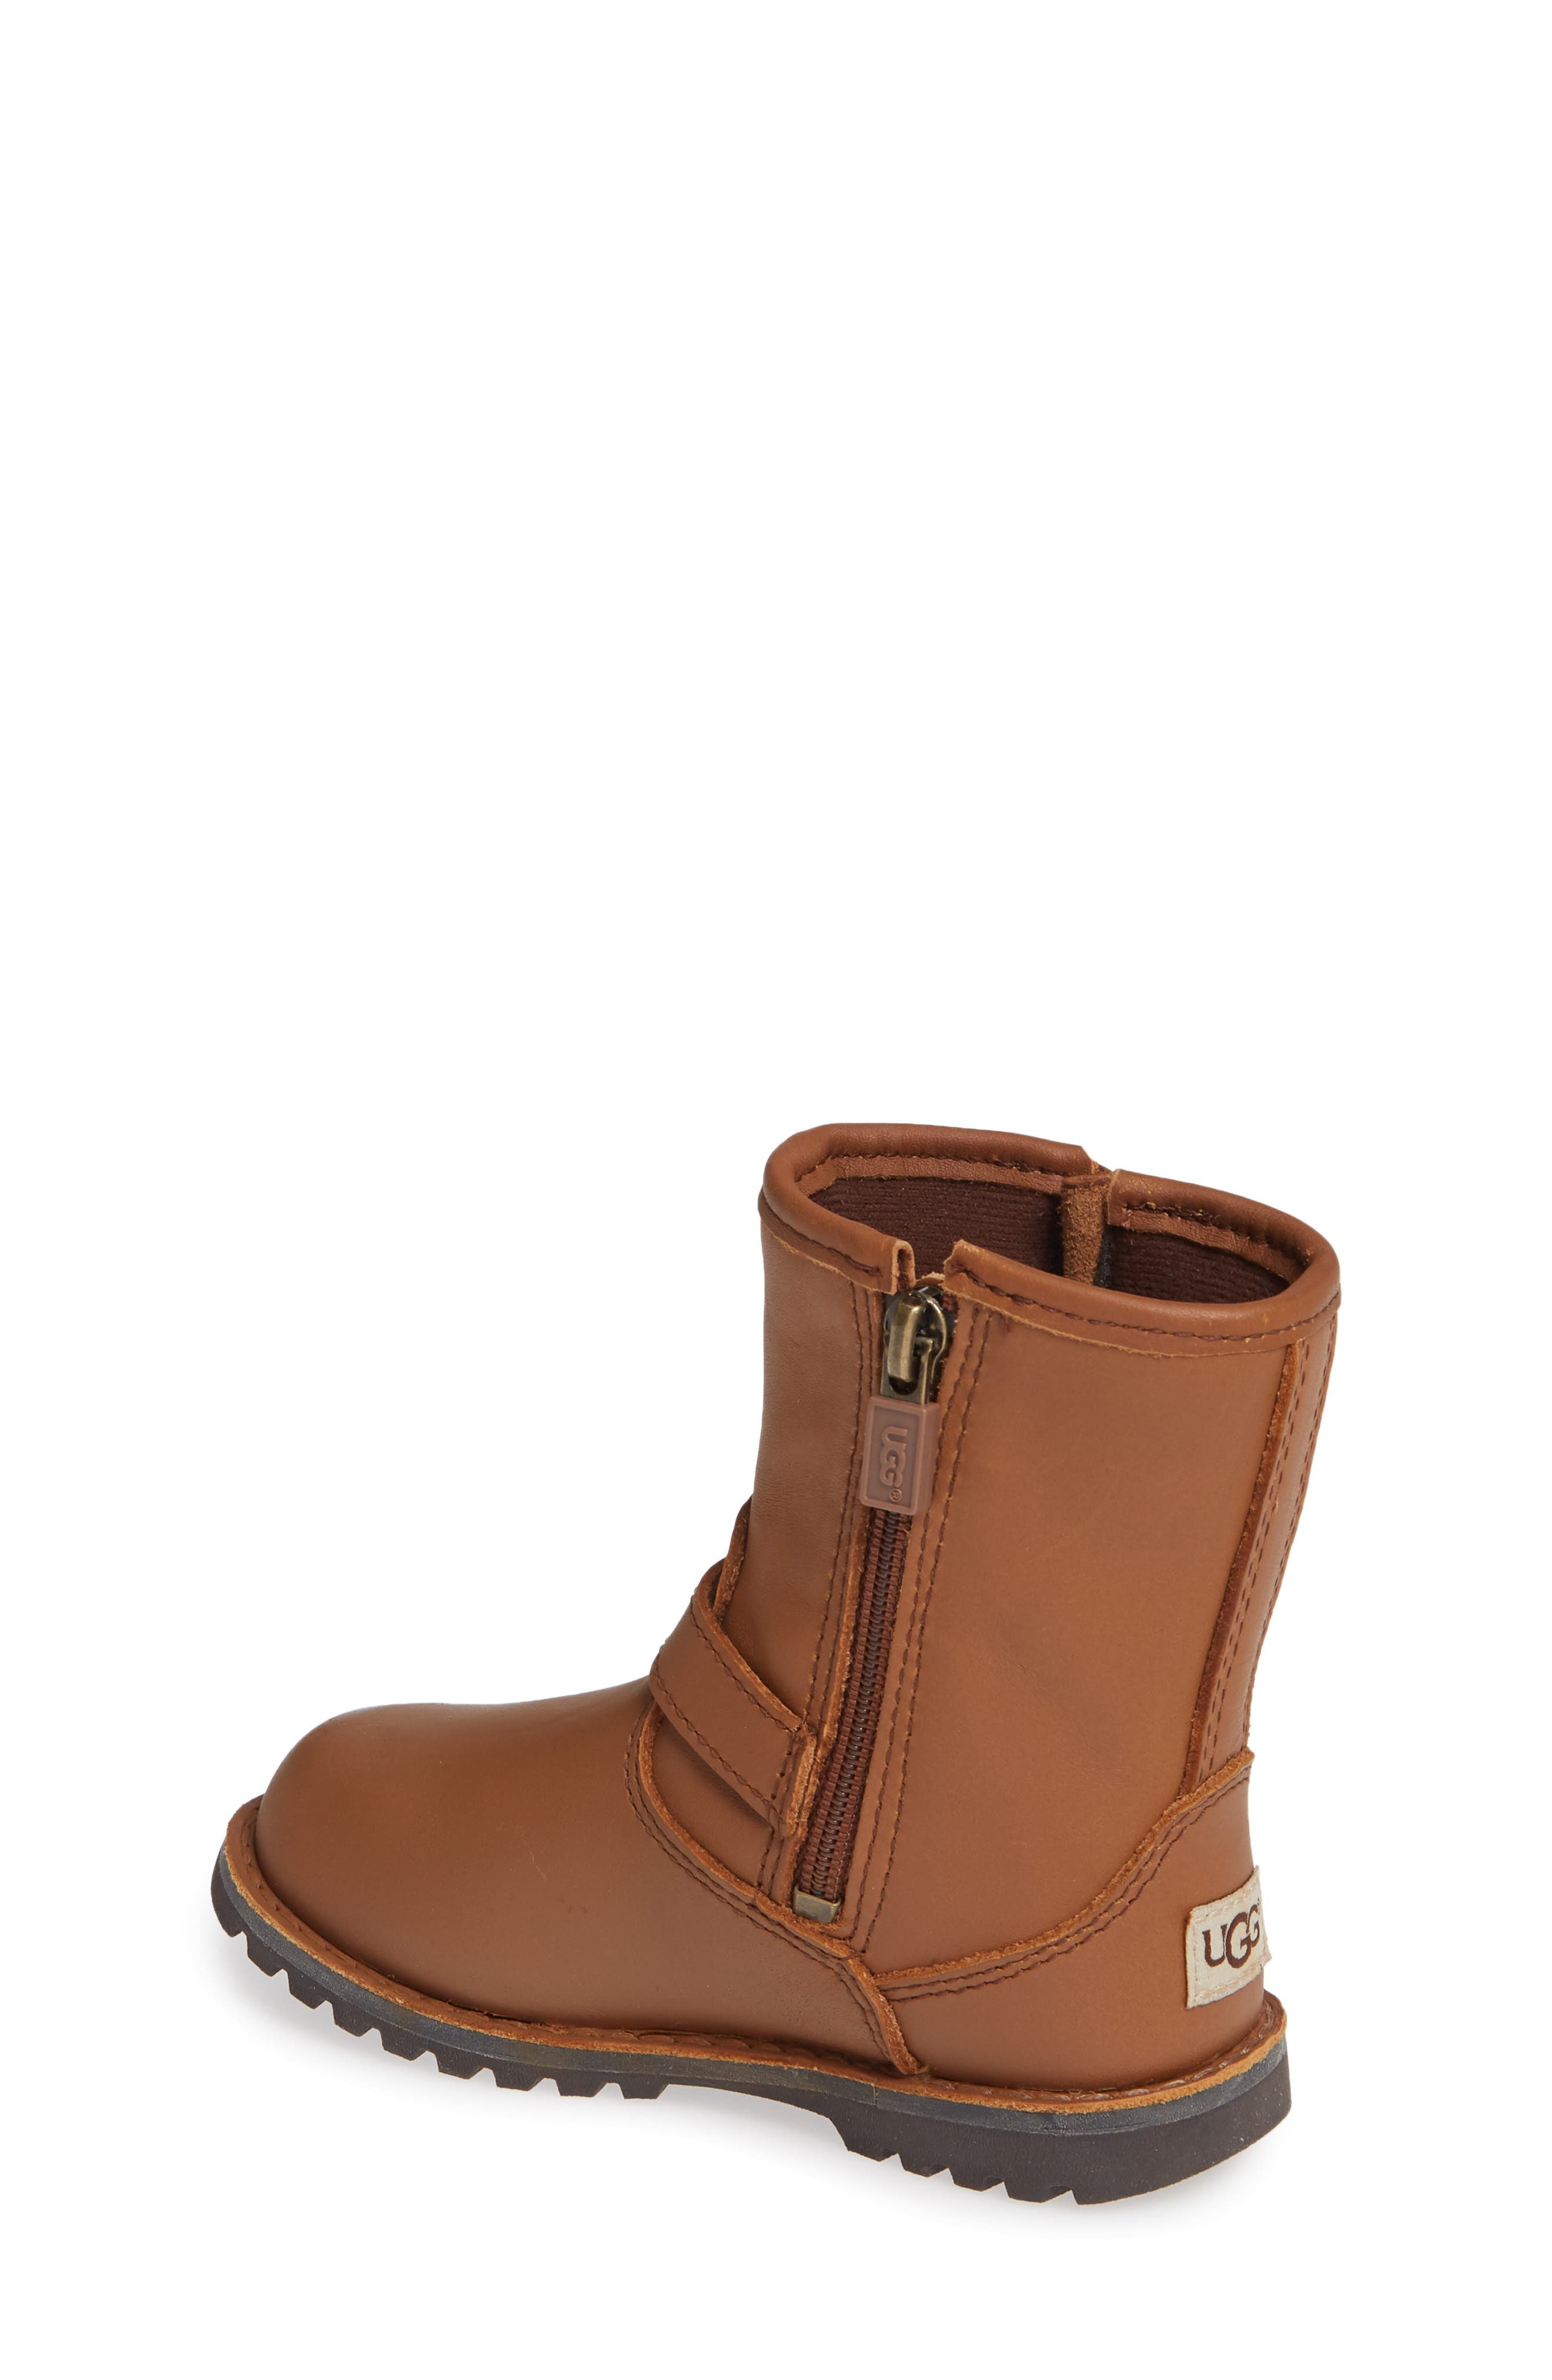 fef1e72c1c4 Toddler UGG® Shoes (Sizes 7.5-12) | Nordstrom